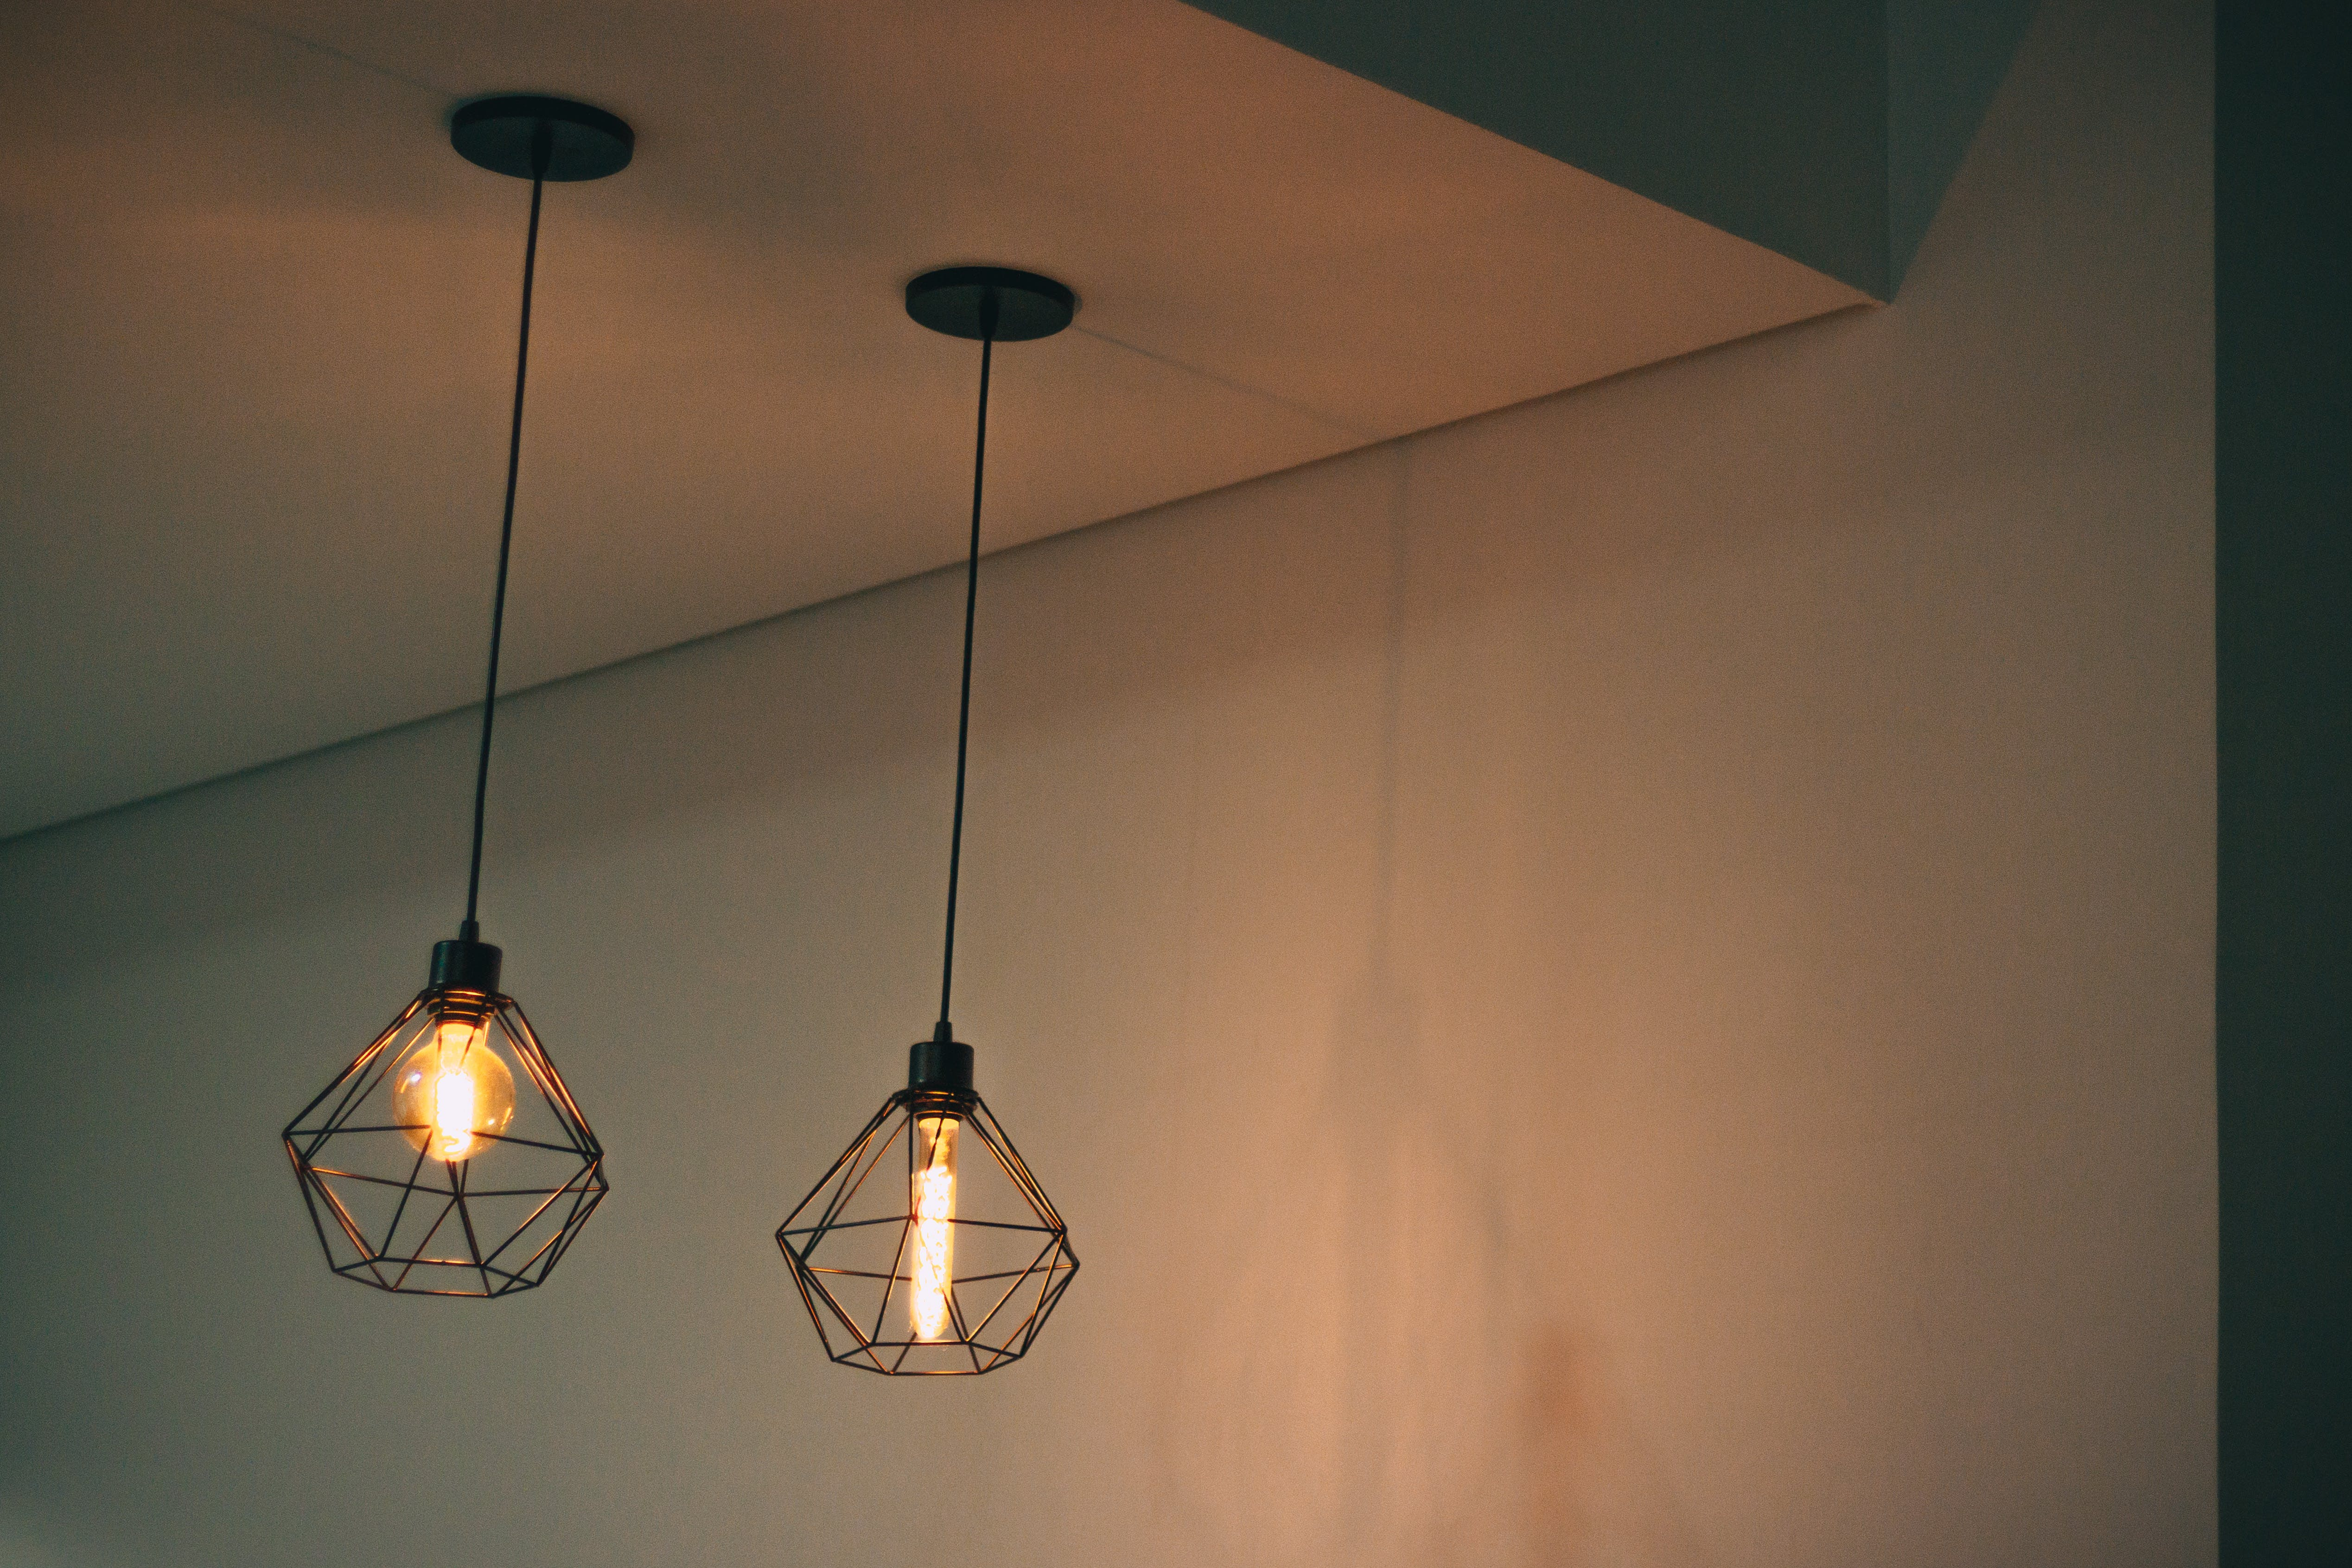 Two Black Pendant Lamp on White Concrete Ceiling